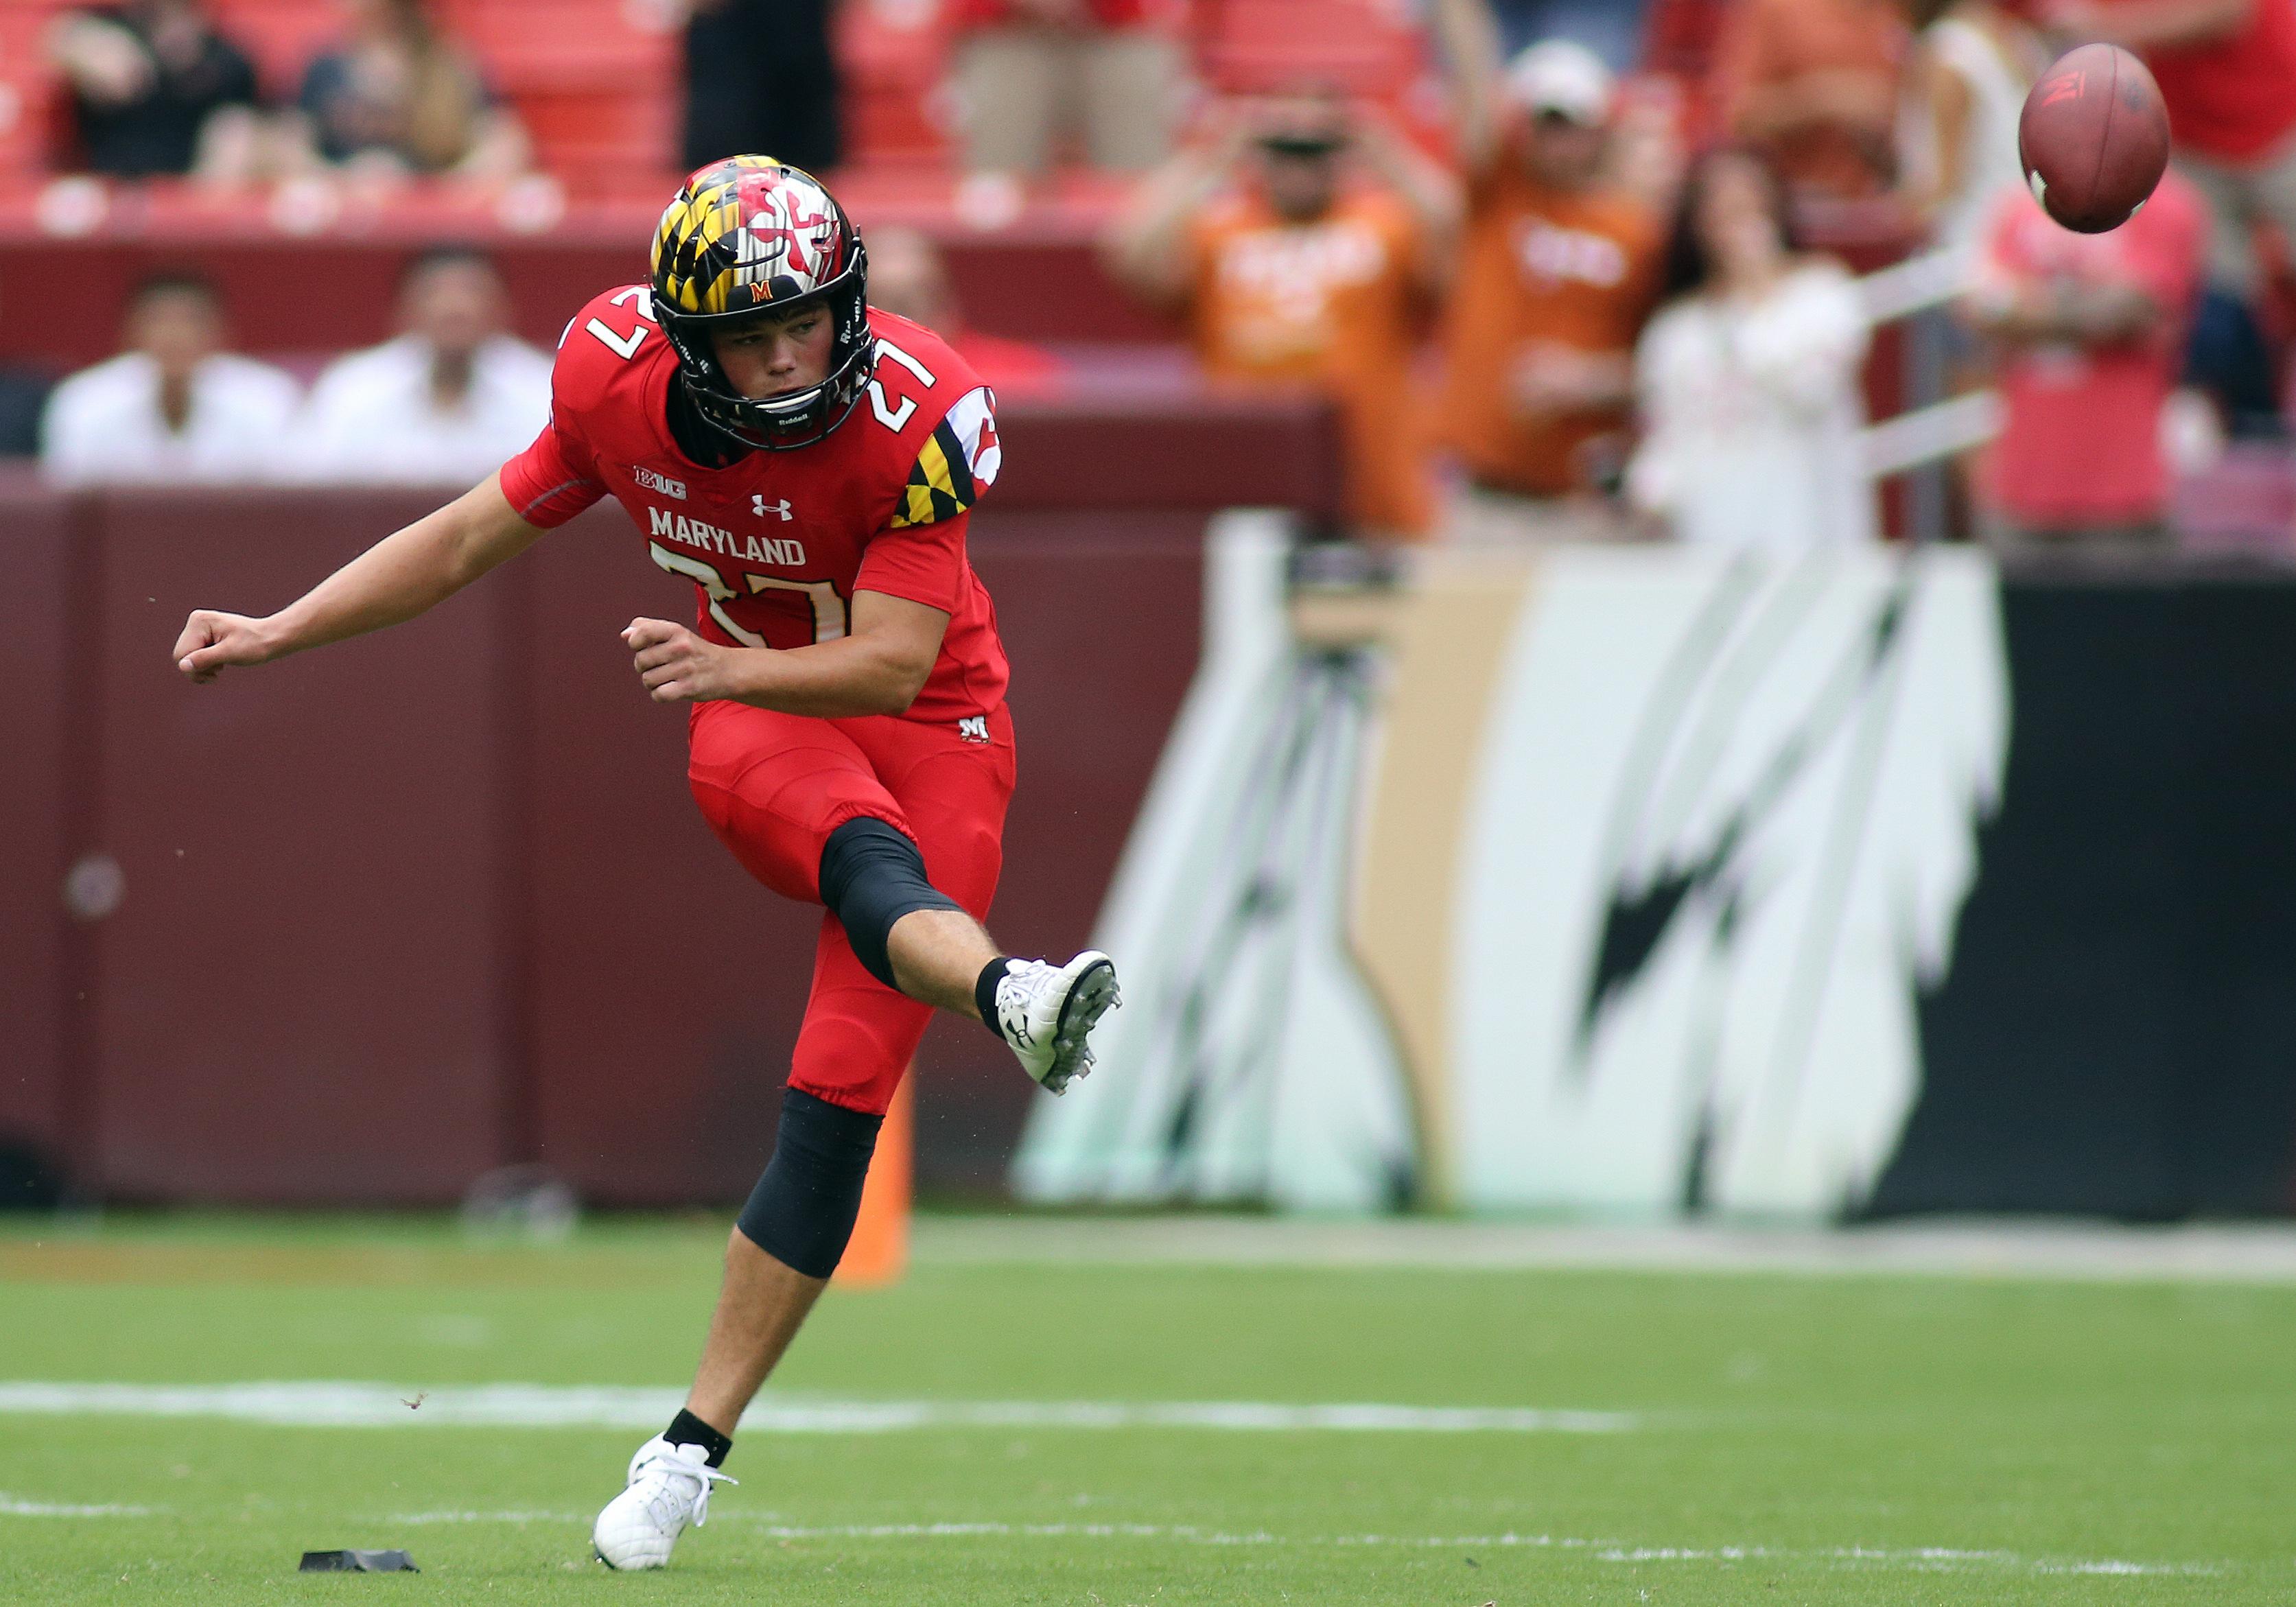 COLLEGE FOOTBALL: SEP 01 Texas v Maryland